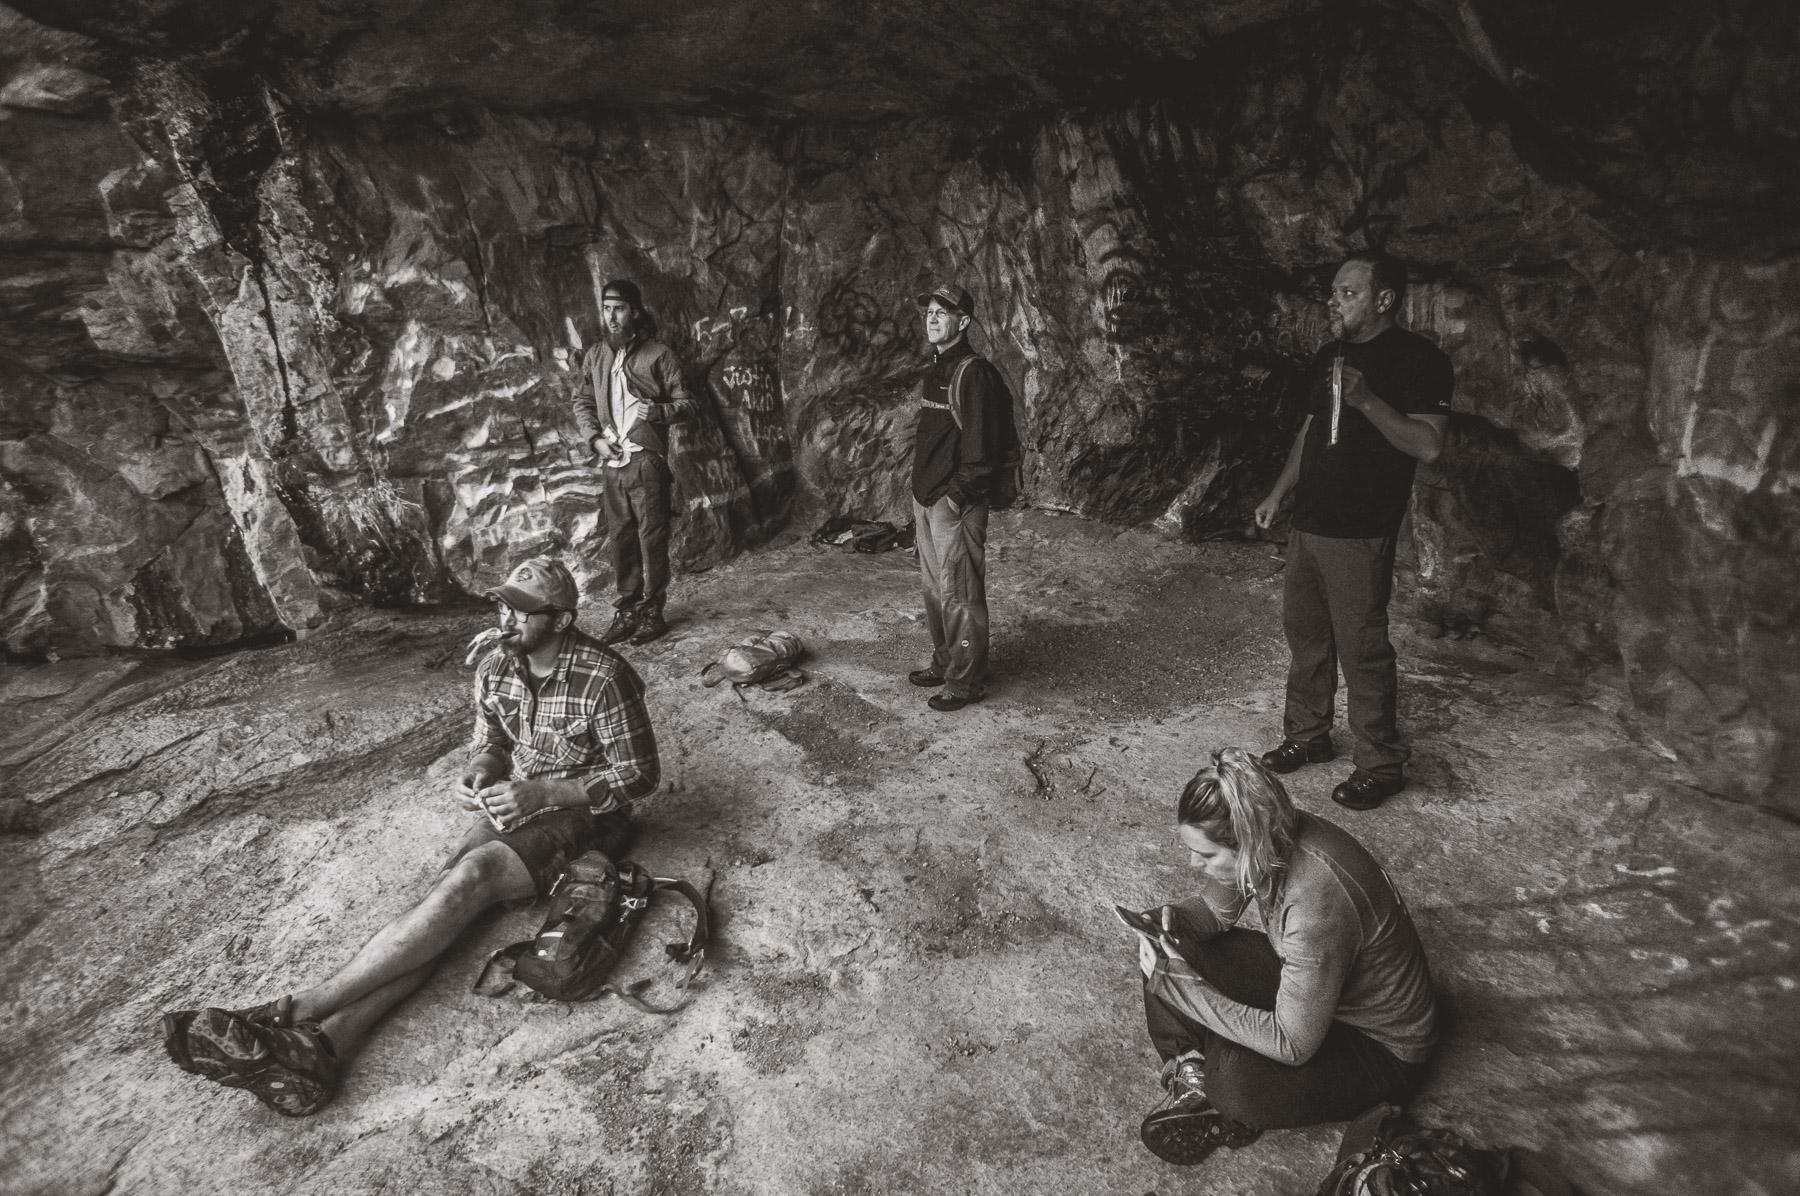 Spanish Cave 11-6-16 (15 of 19).JPG